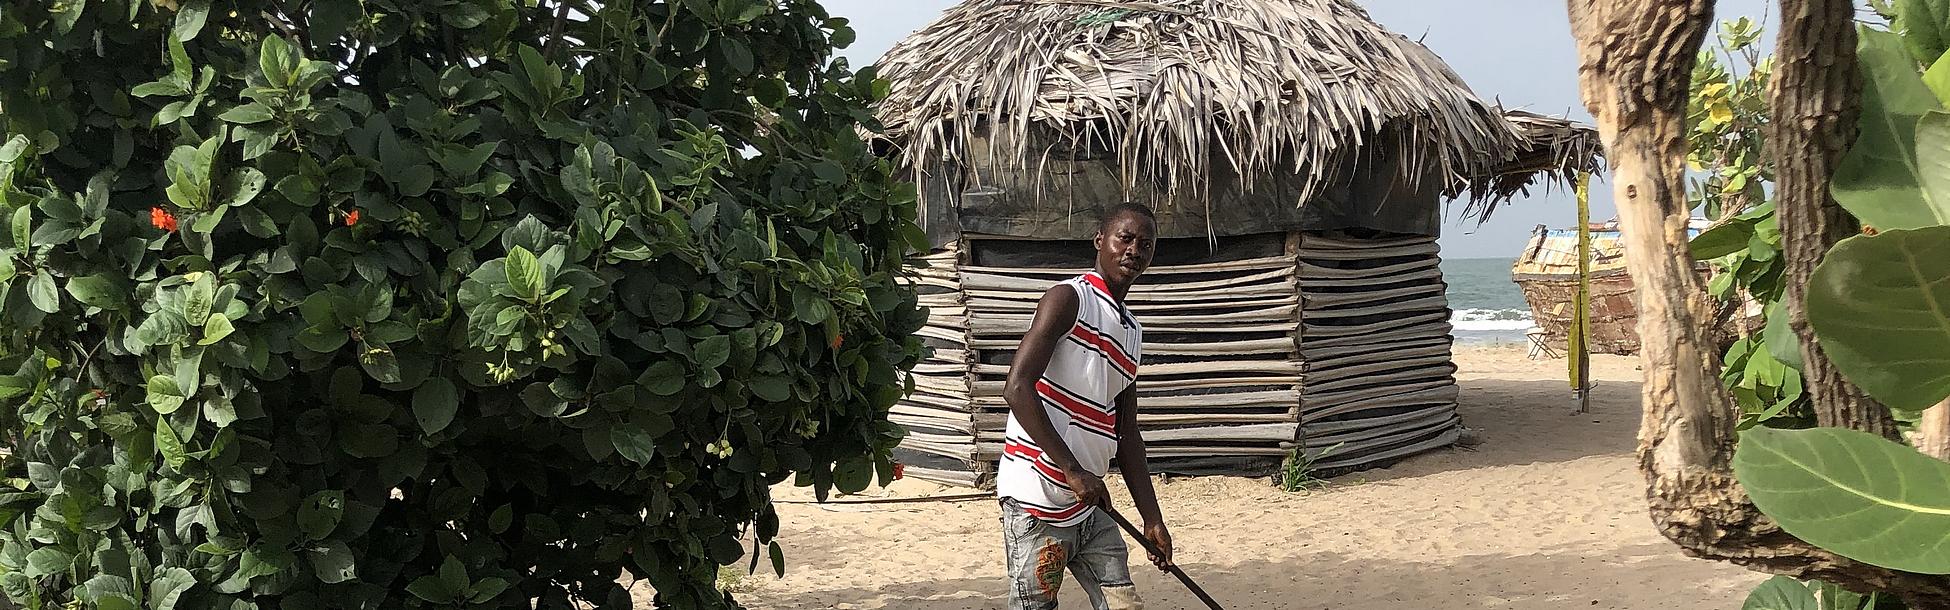 Umweltschutz Gambia Kopfbild I I